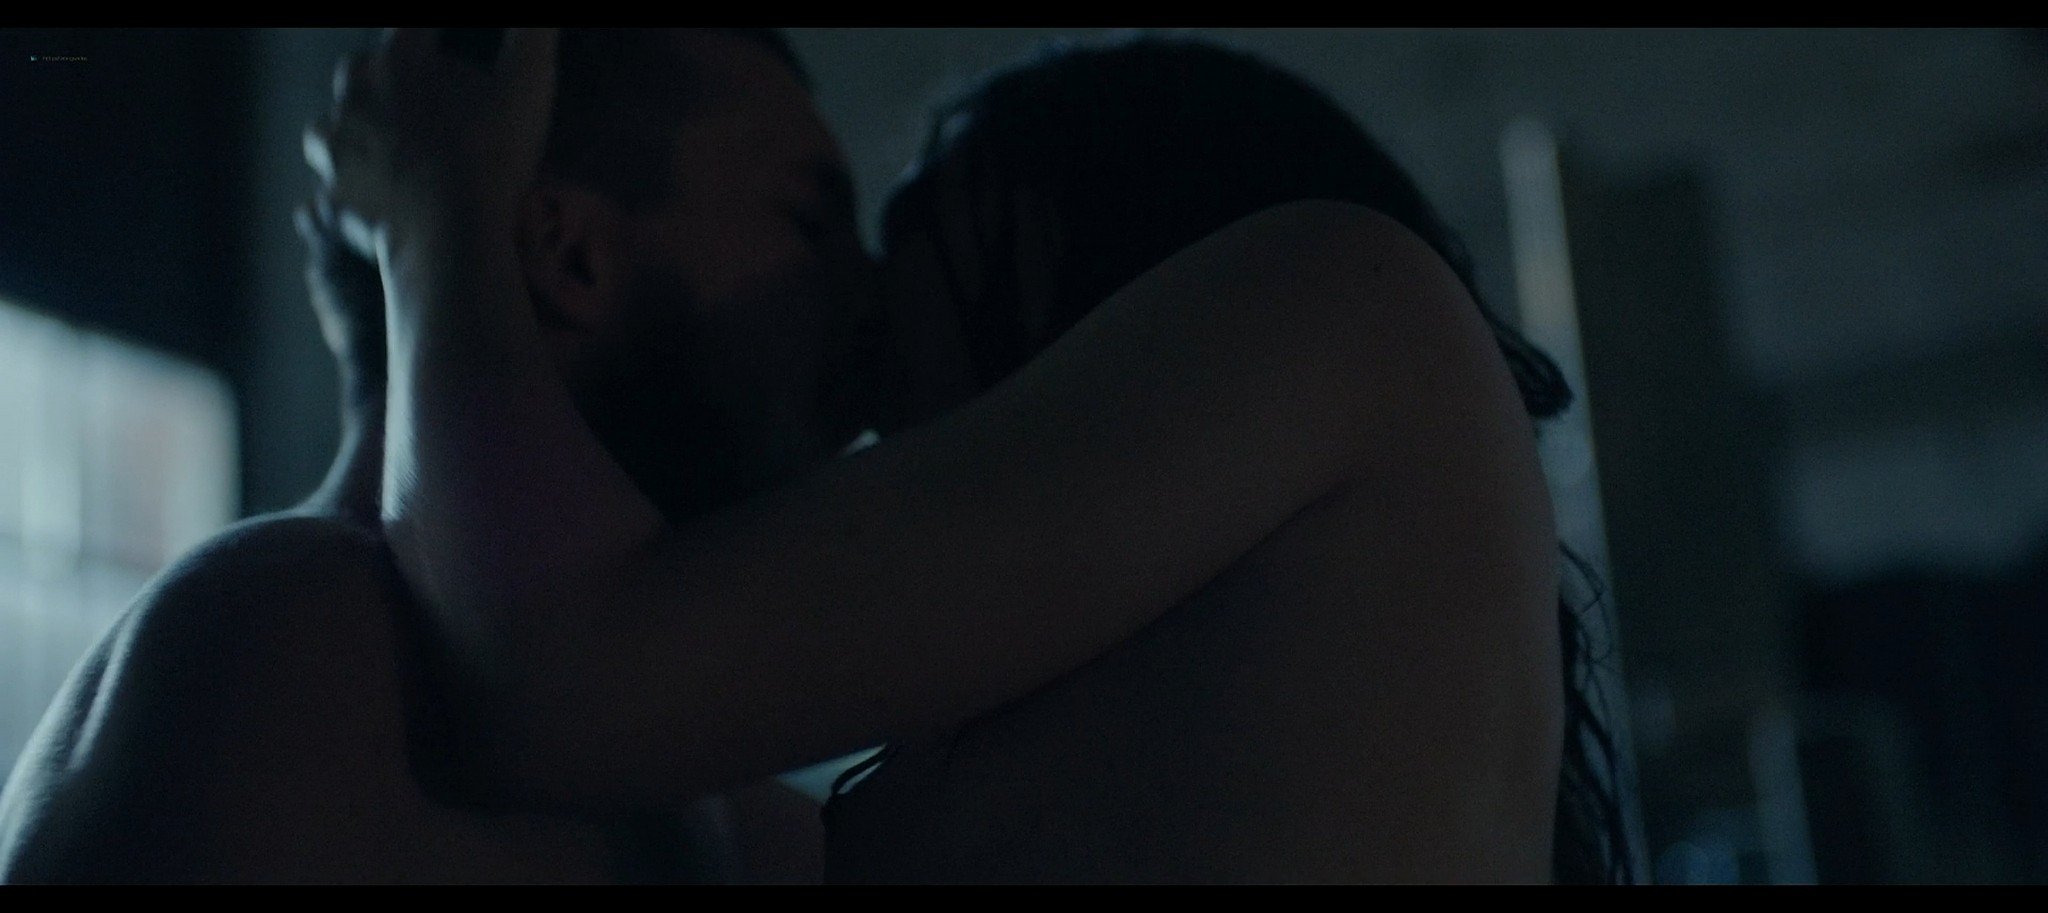 Julie Christiansen nude sex Marie Boda sexy While We Live DK 2017 1080p BluRay 9